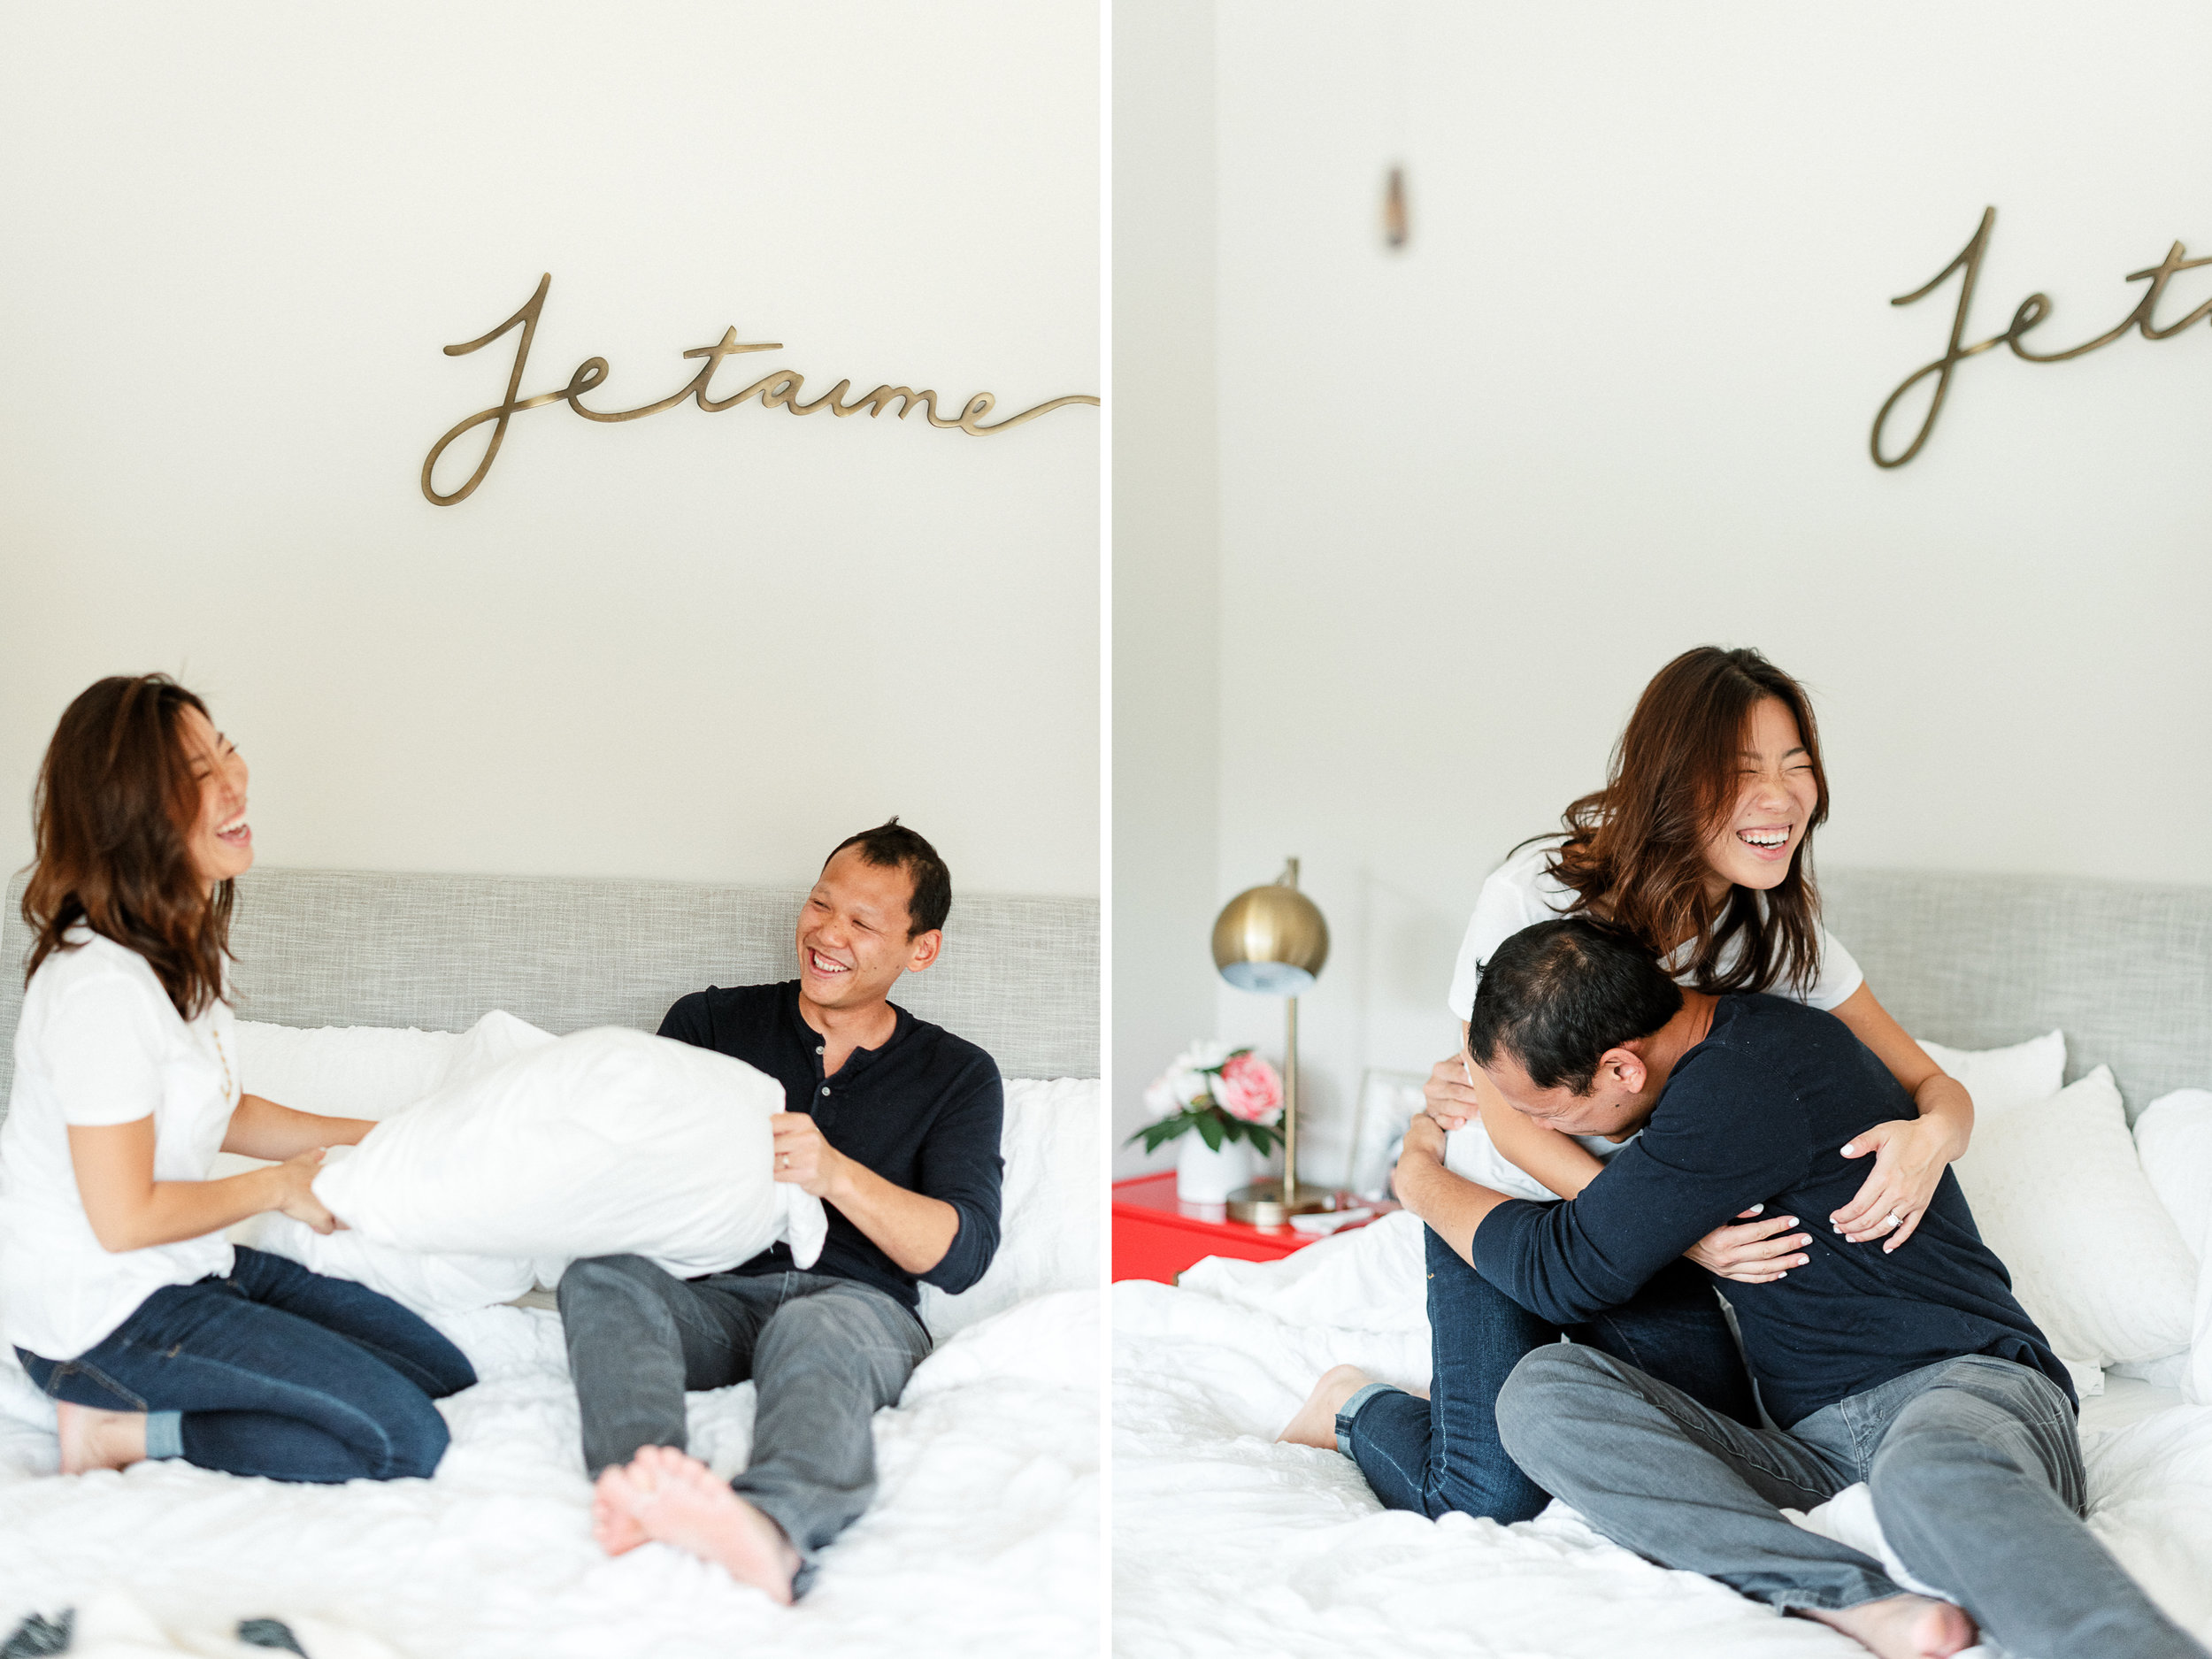 Houston-Wedding-Photographer-Best-Top-Luxury-Destination-Engagements-Portrait-Austin-Photography-120.jpg